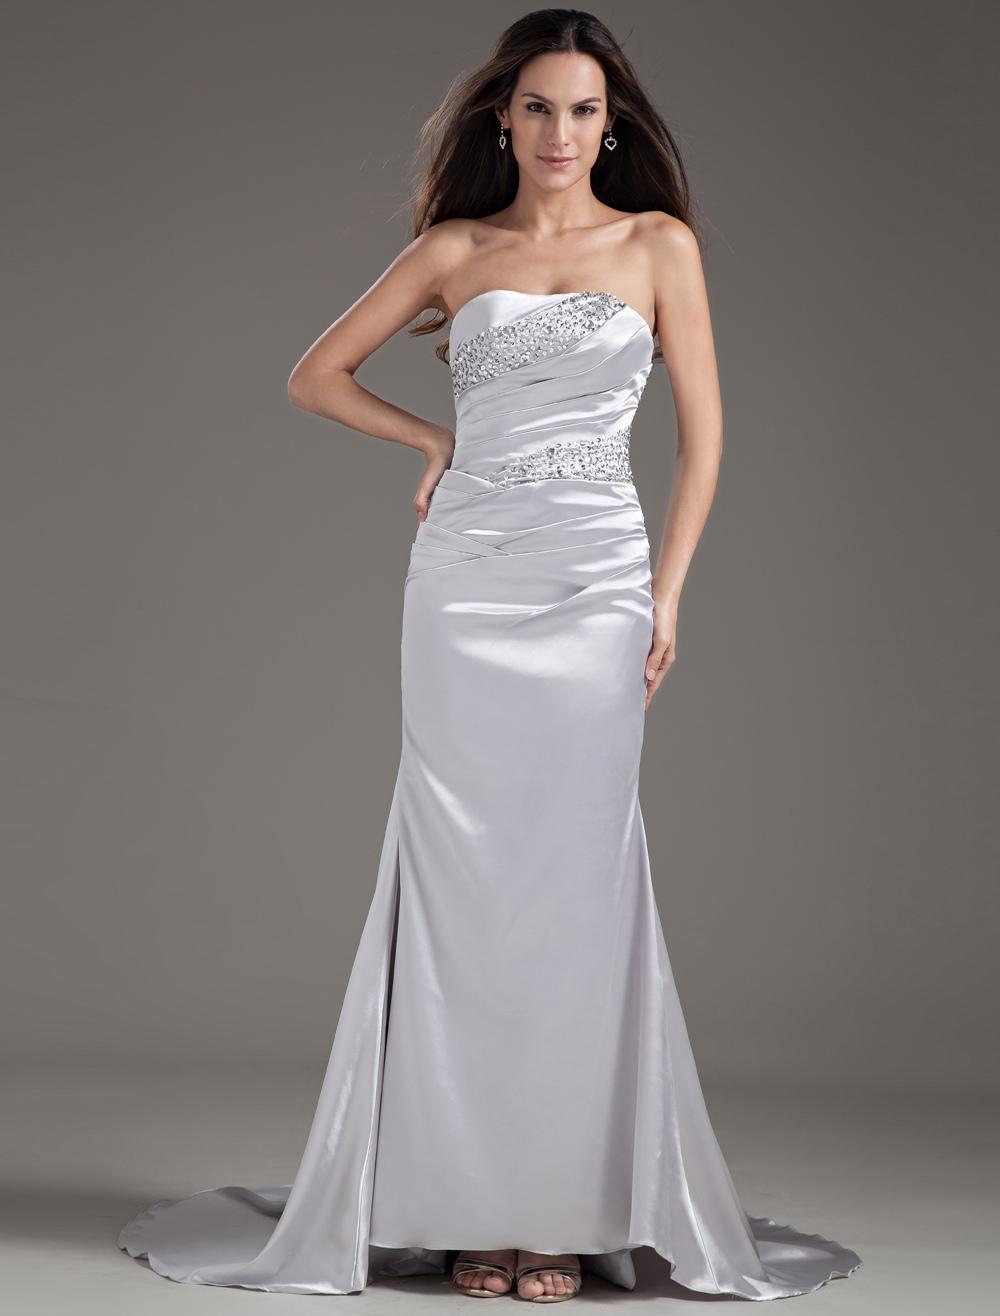 Elegant Sheath Sequin Strapless Silver Evening Dress (Wedding Evening Dresses) photo